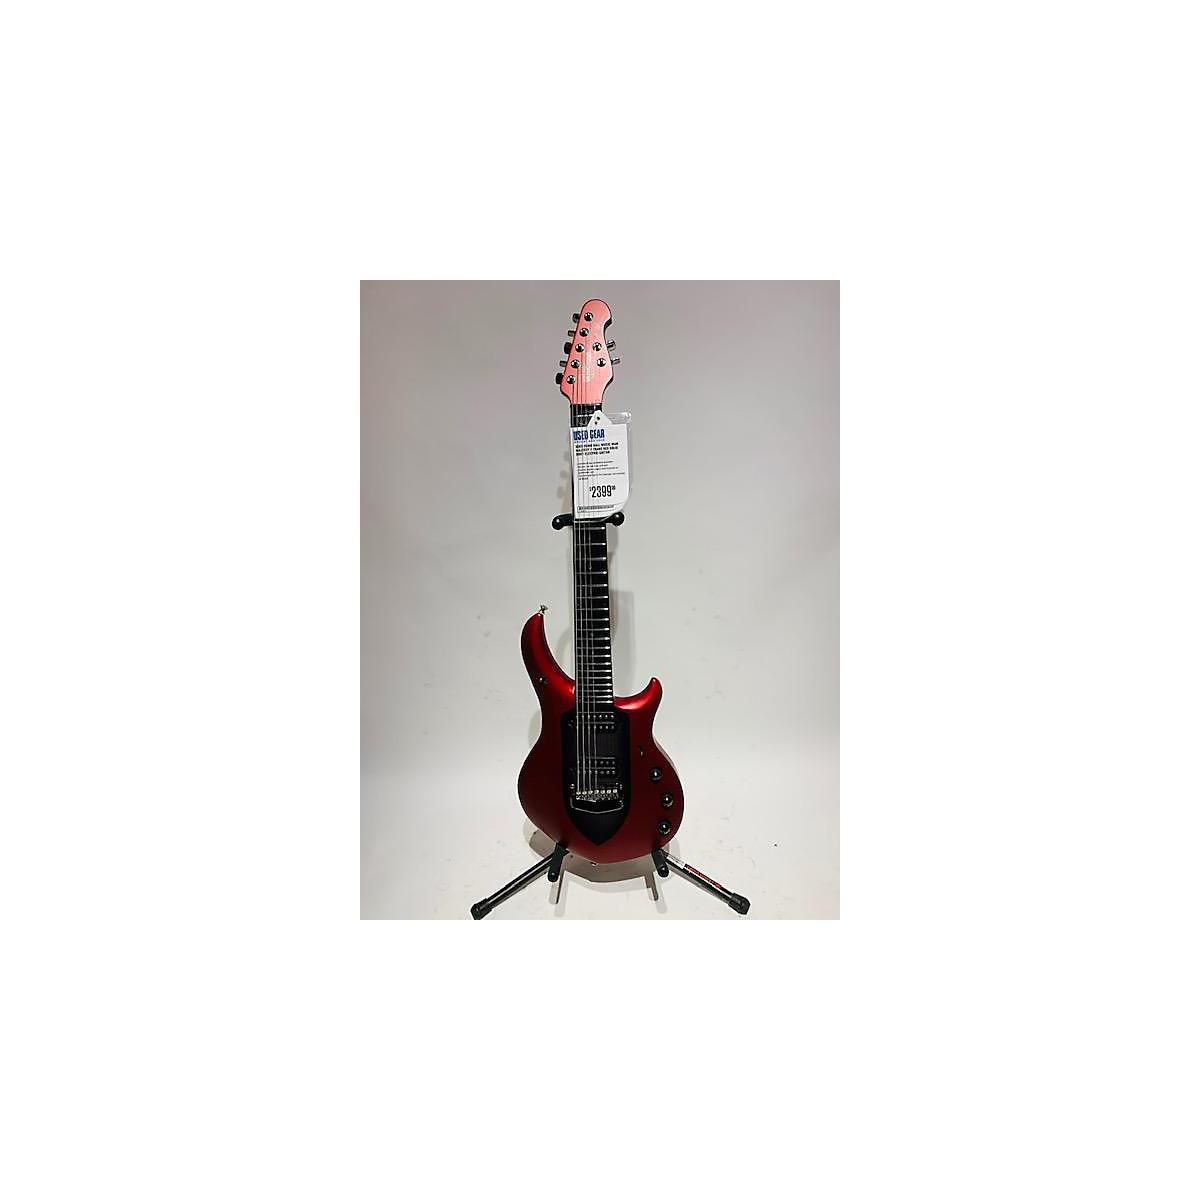 Ernie Ball Music Man Majesty 7 Solid Body Electric Guitar